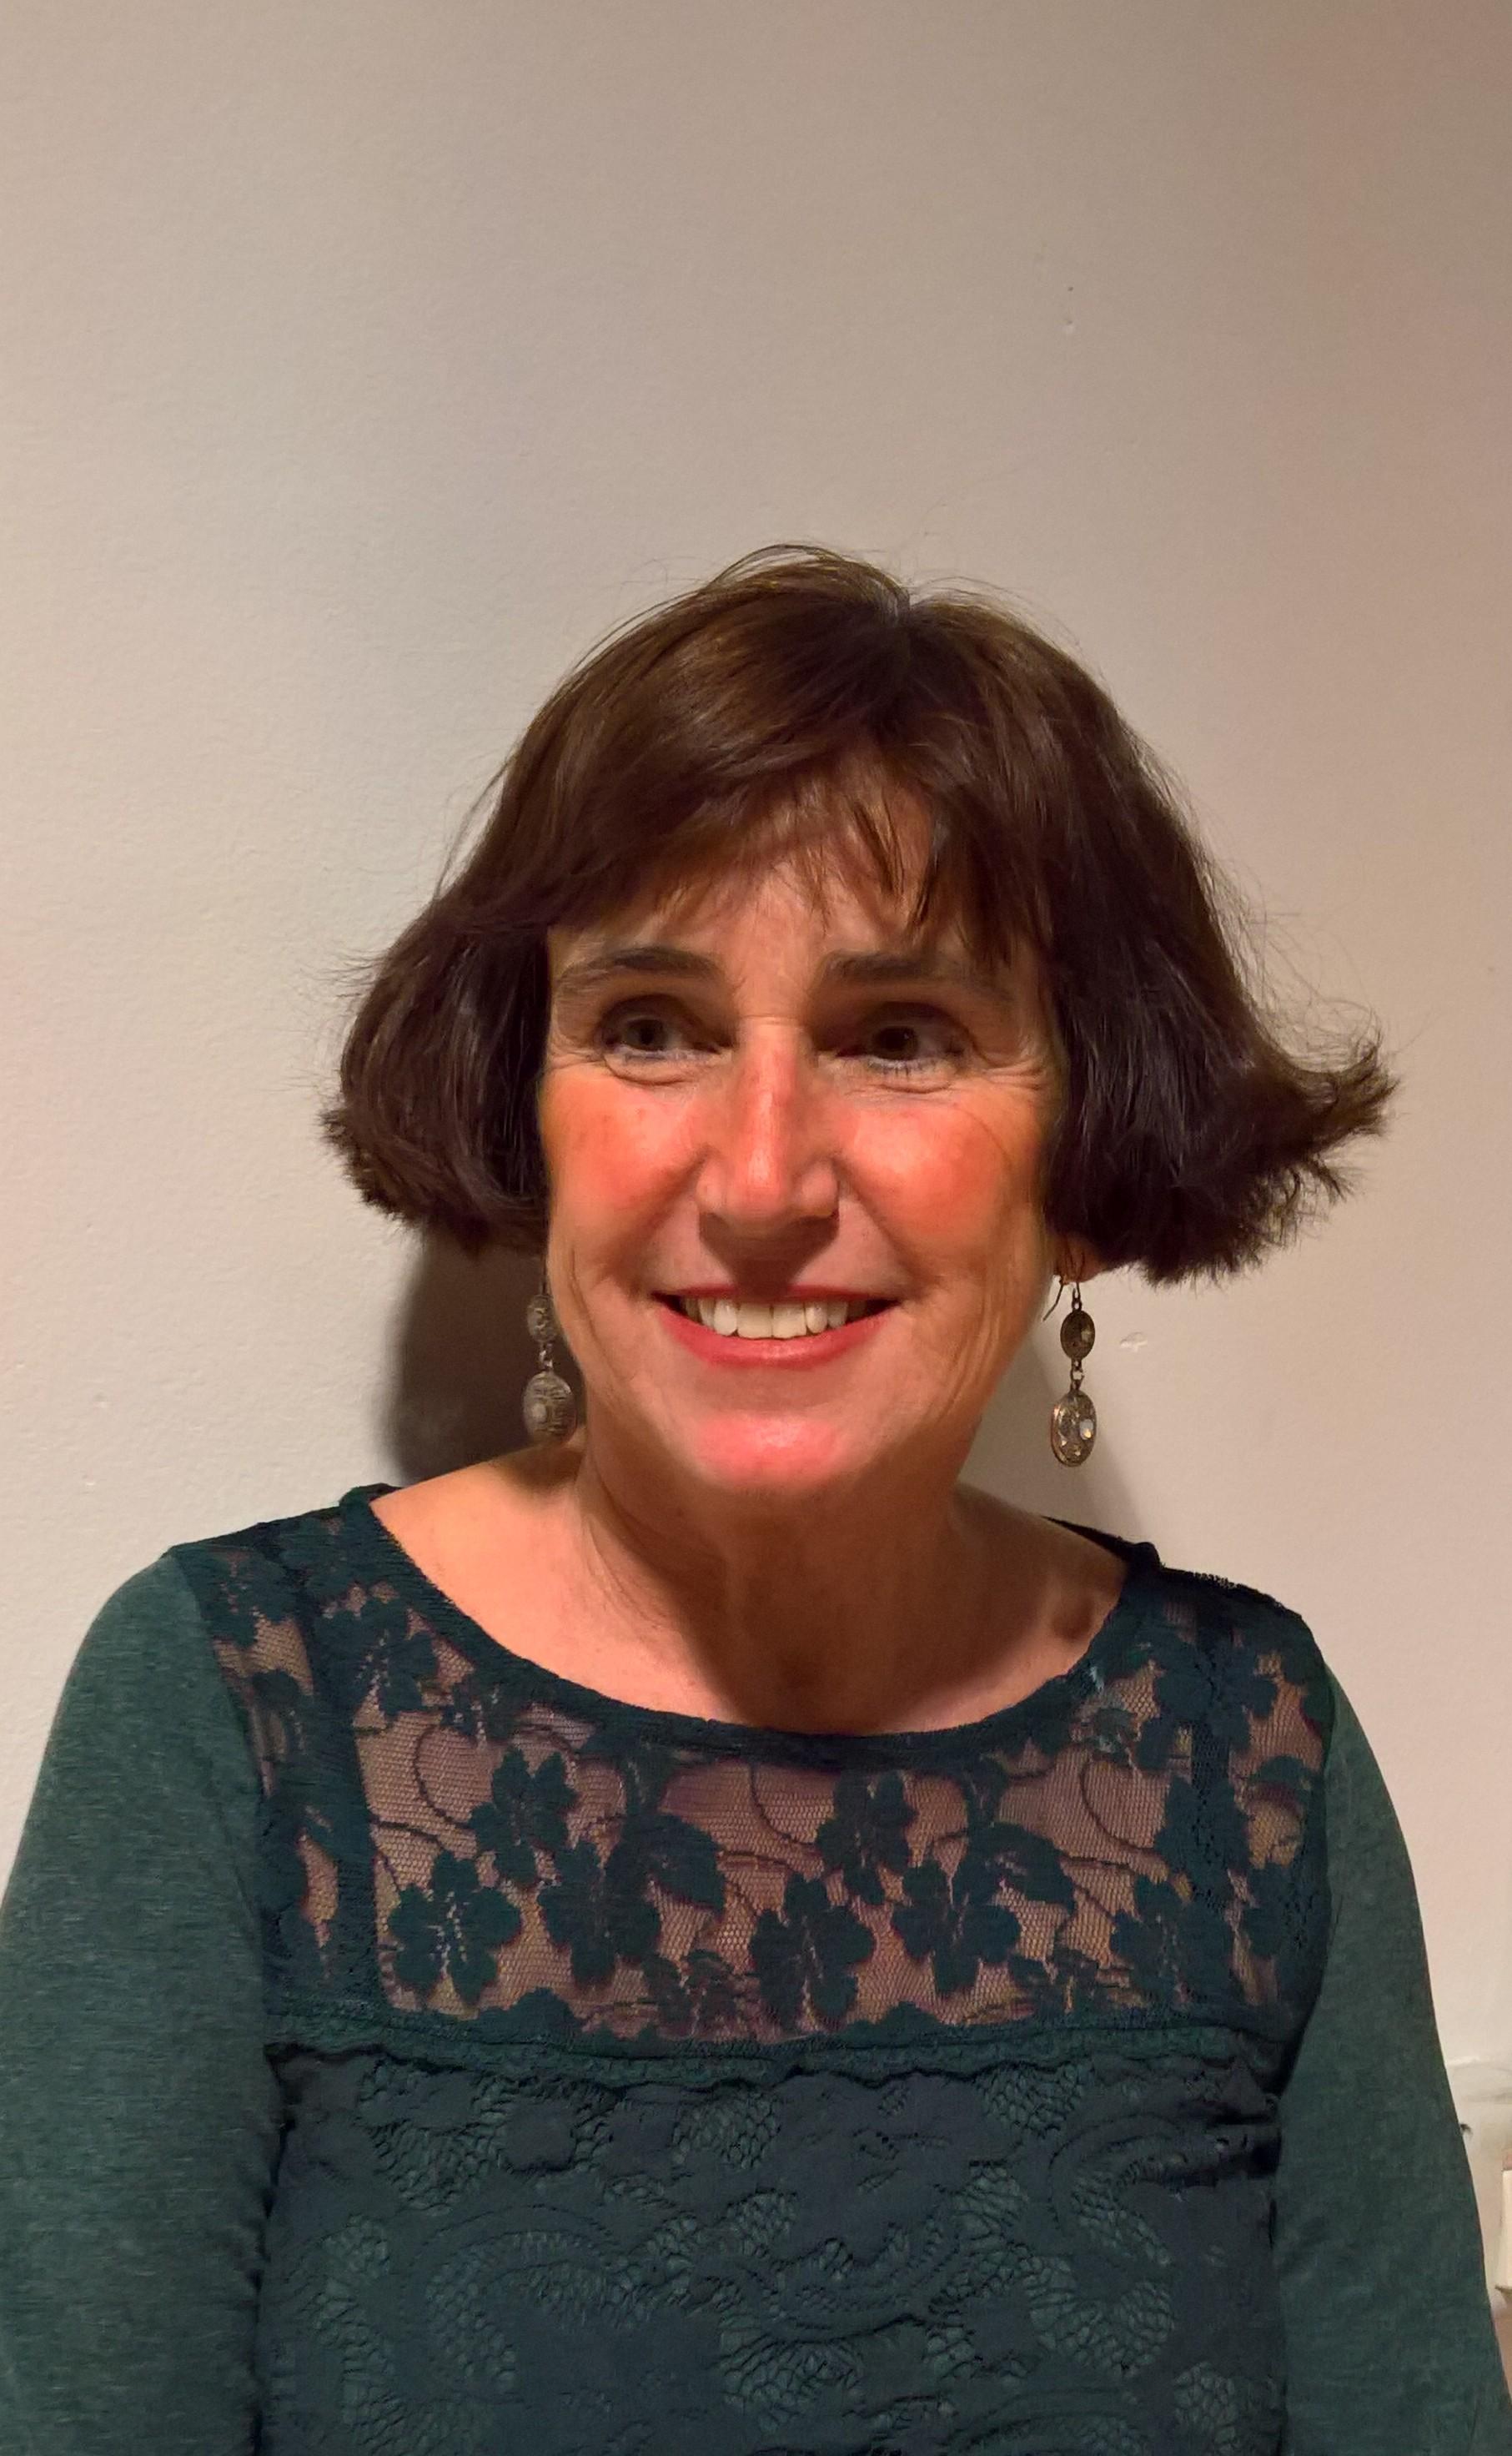 Manuela Corsi